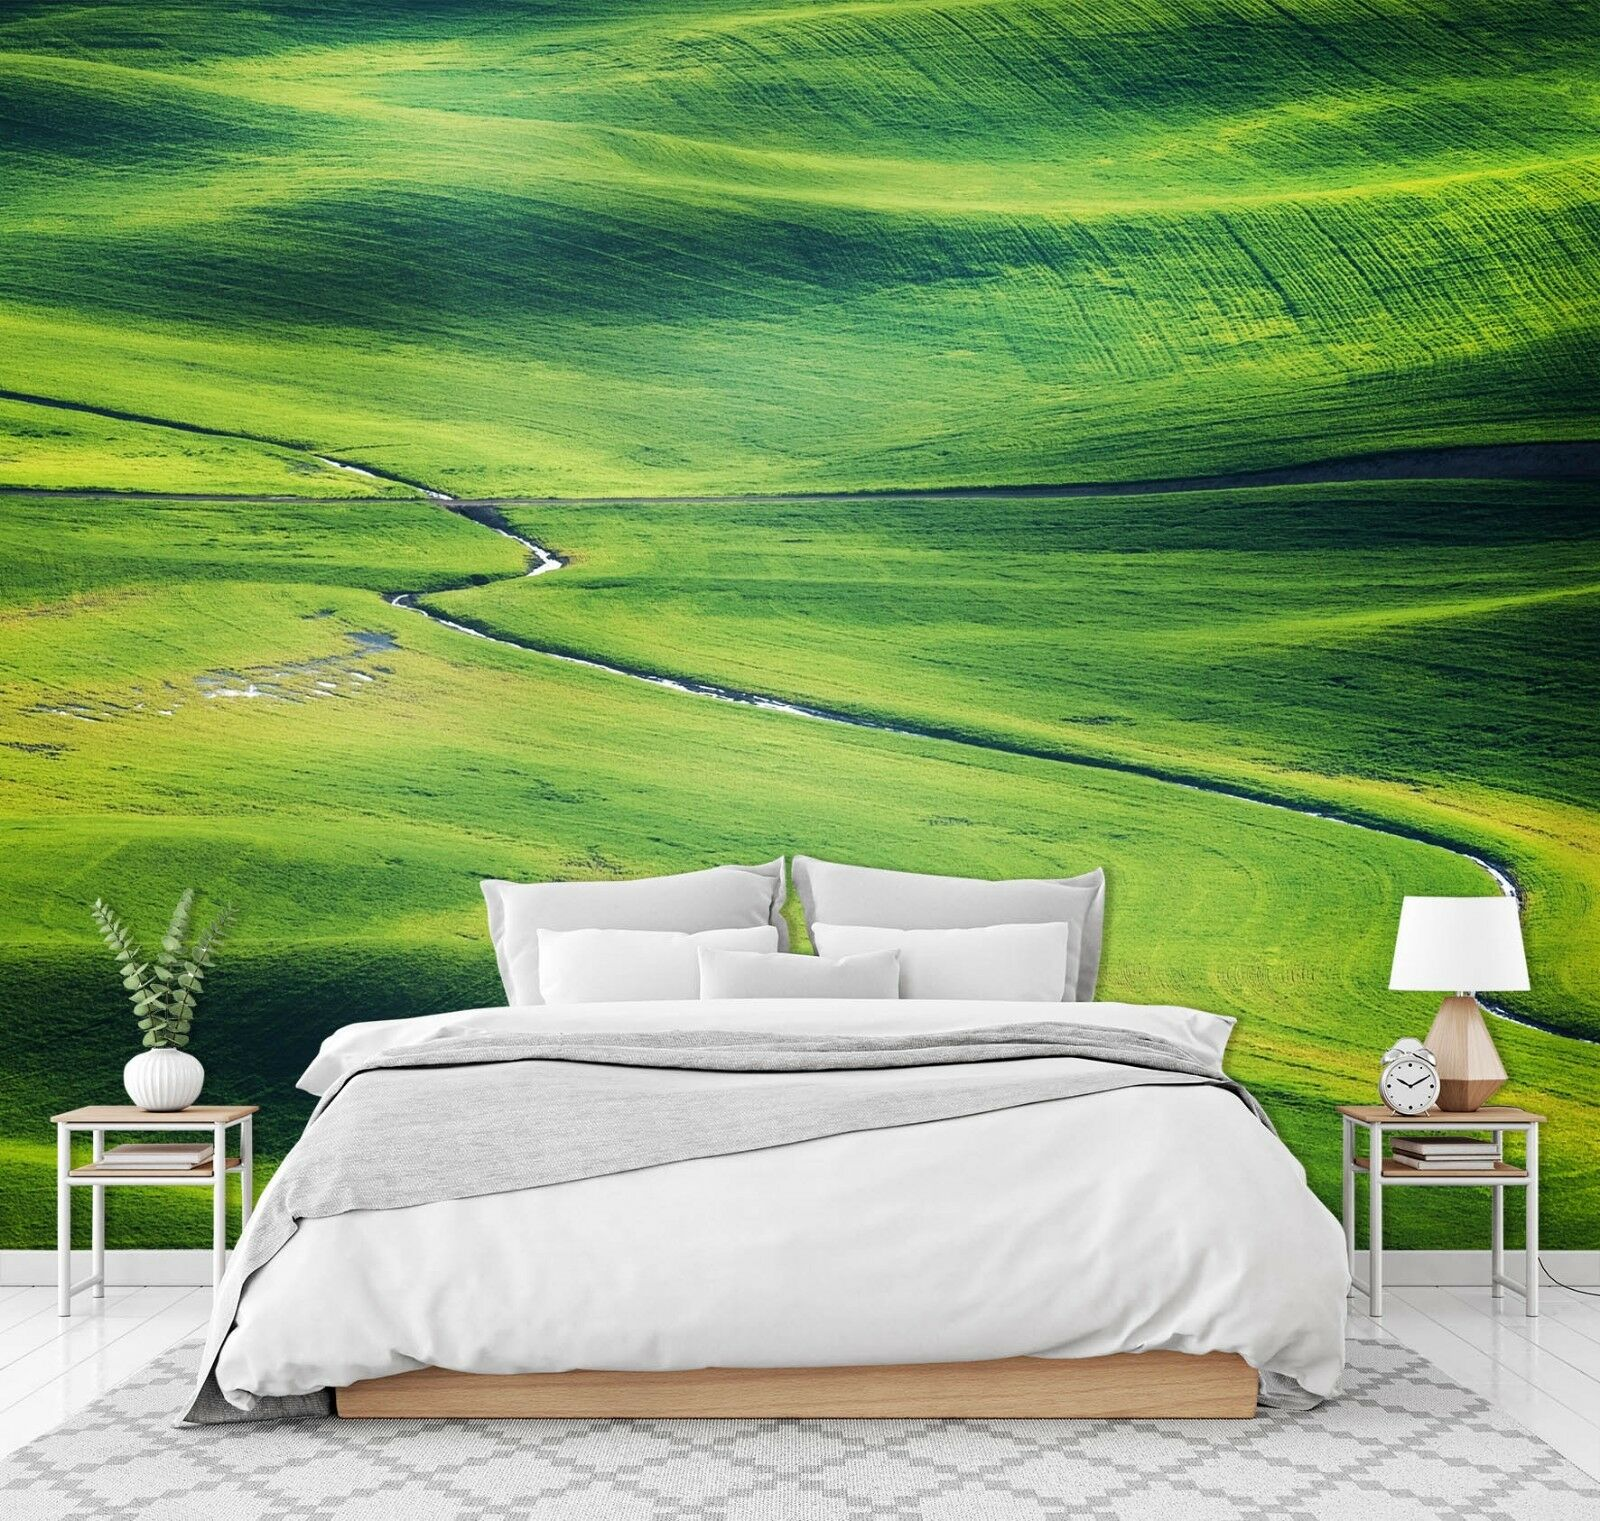 3D Grün Lawn 7184 Wall Paper Print Wall Decal Deco Indoor Wall Murals US Summer